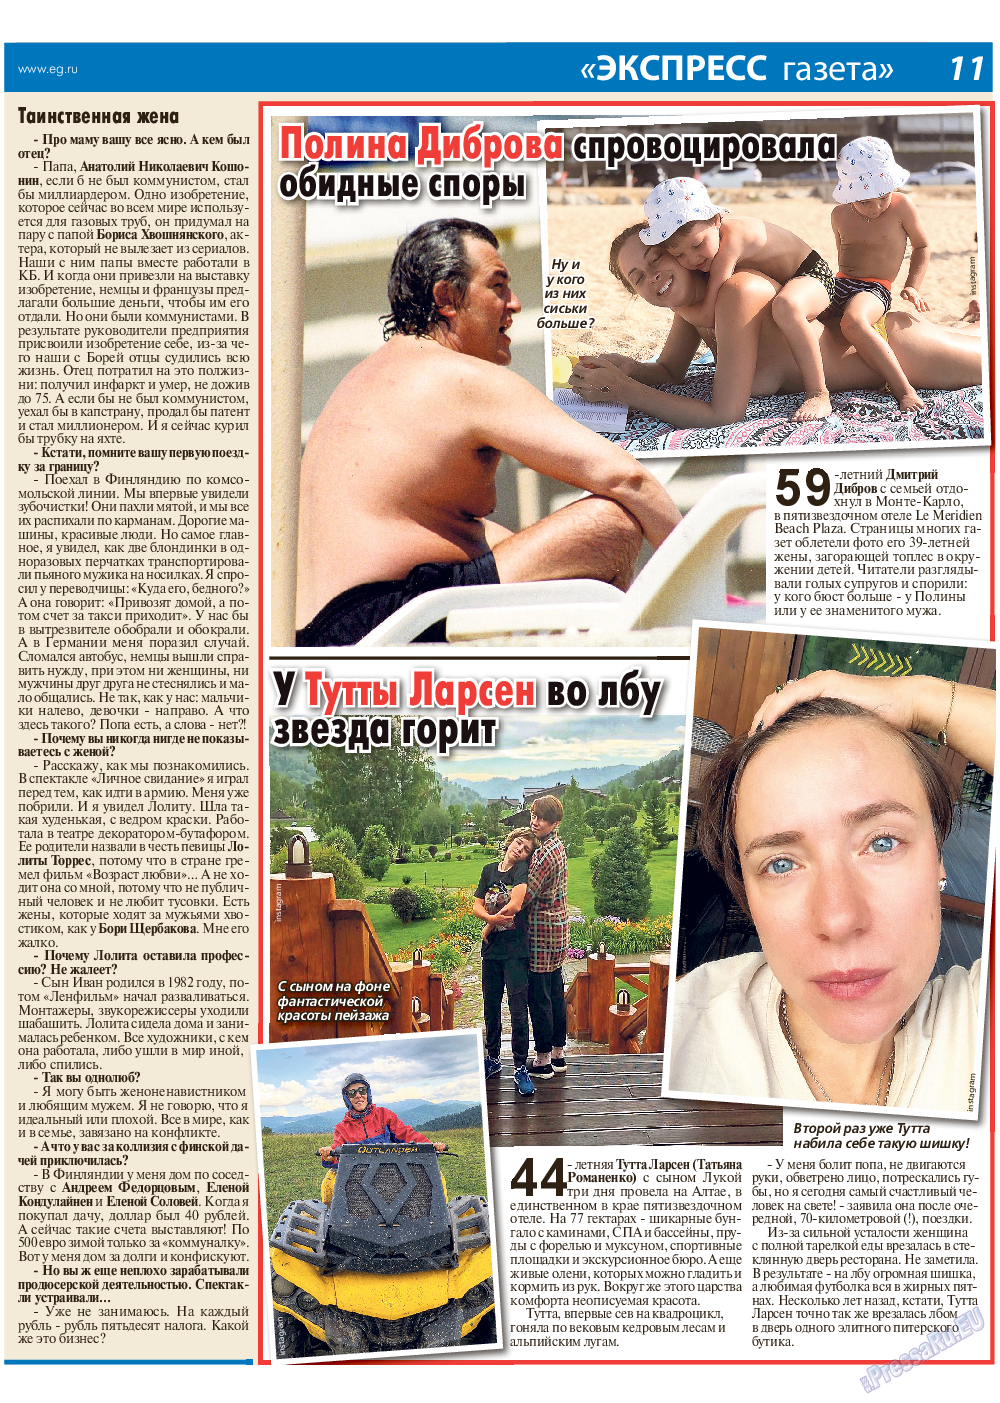 Экспресс газета (газета). 2018 год, номер 10, стр. 11